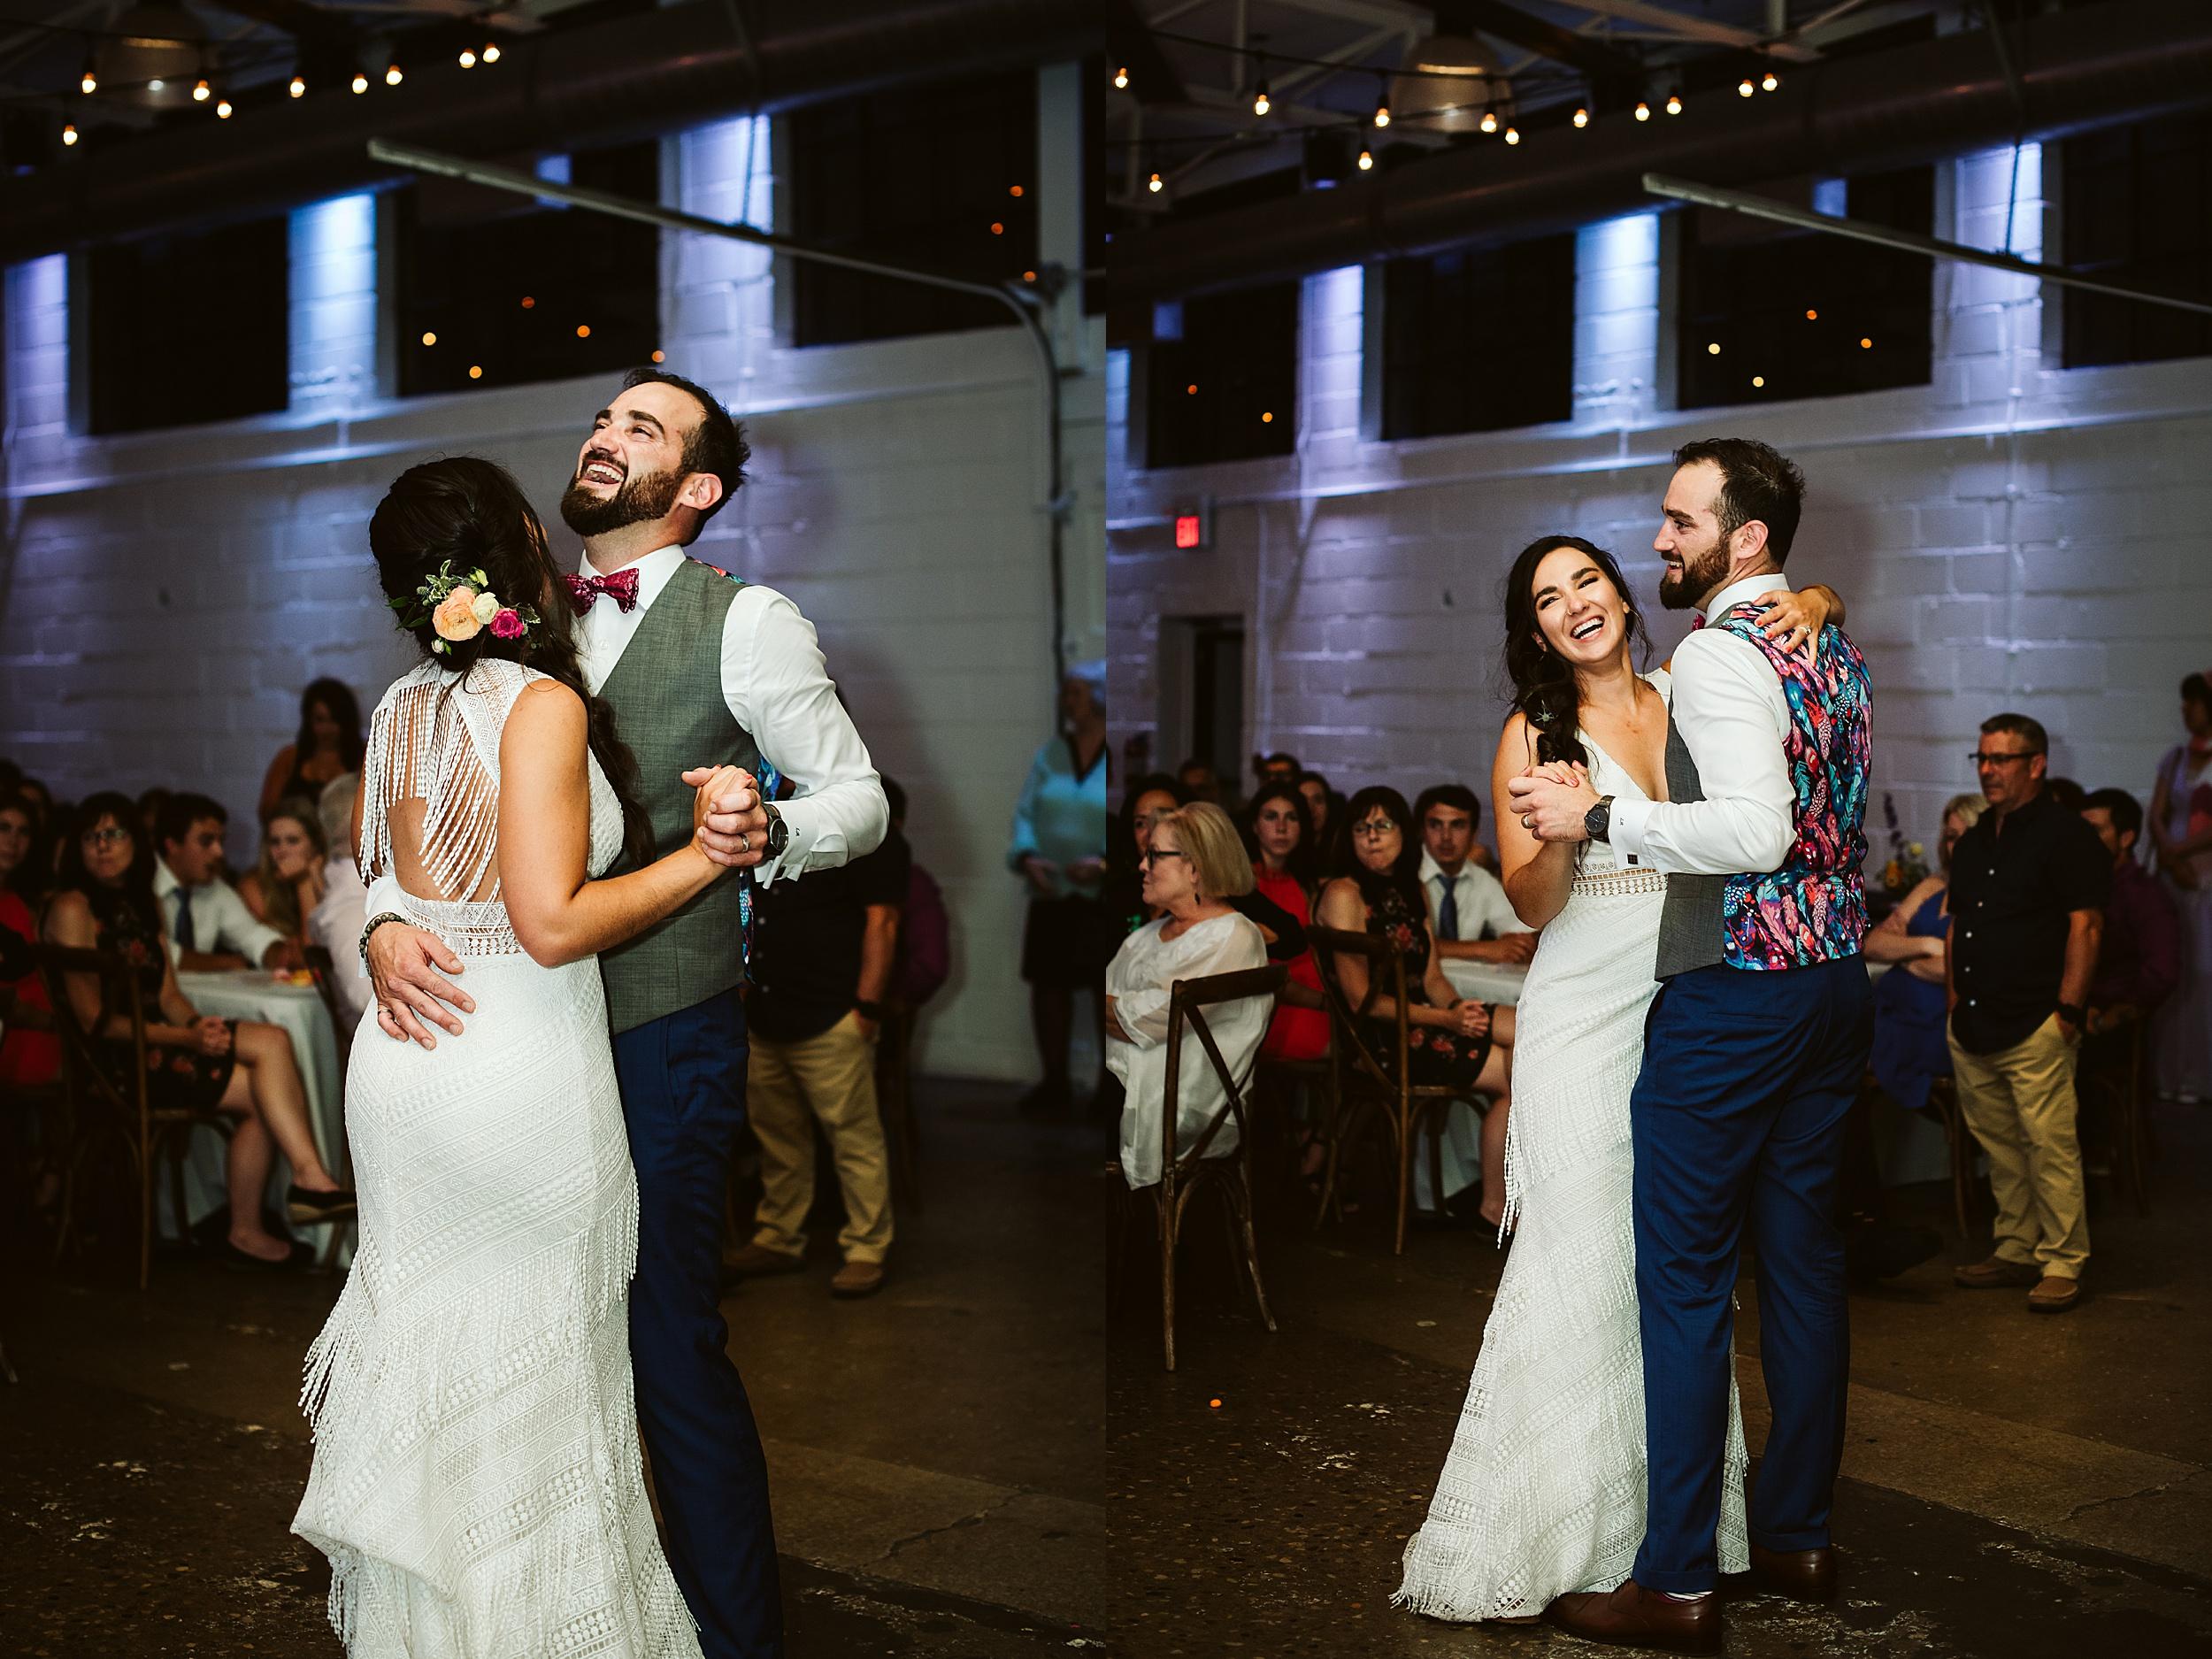 Airship-37-Berkeley-Events-Distillery-District-Wedding-Toronto-Wedding-Photographers_0096.jpg